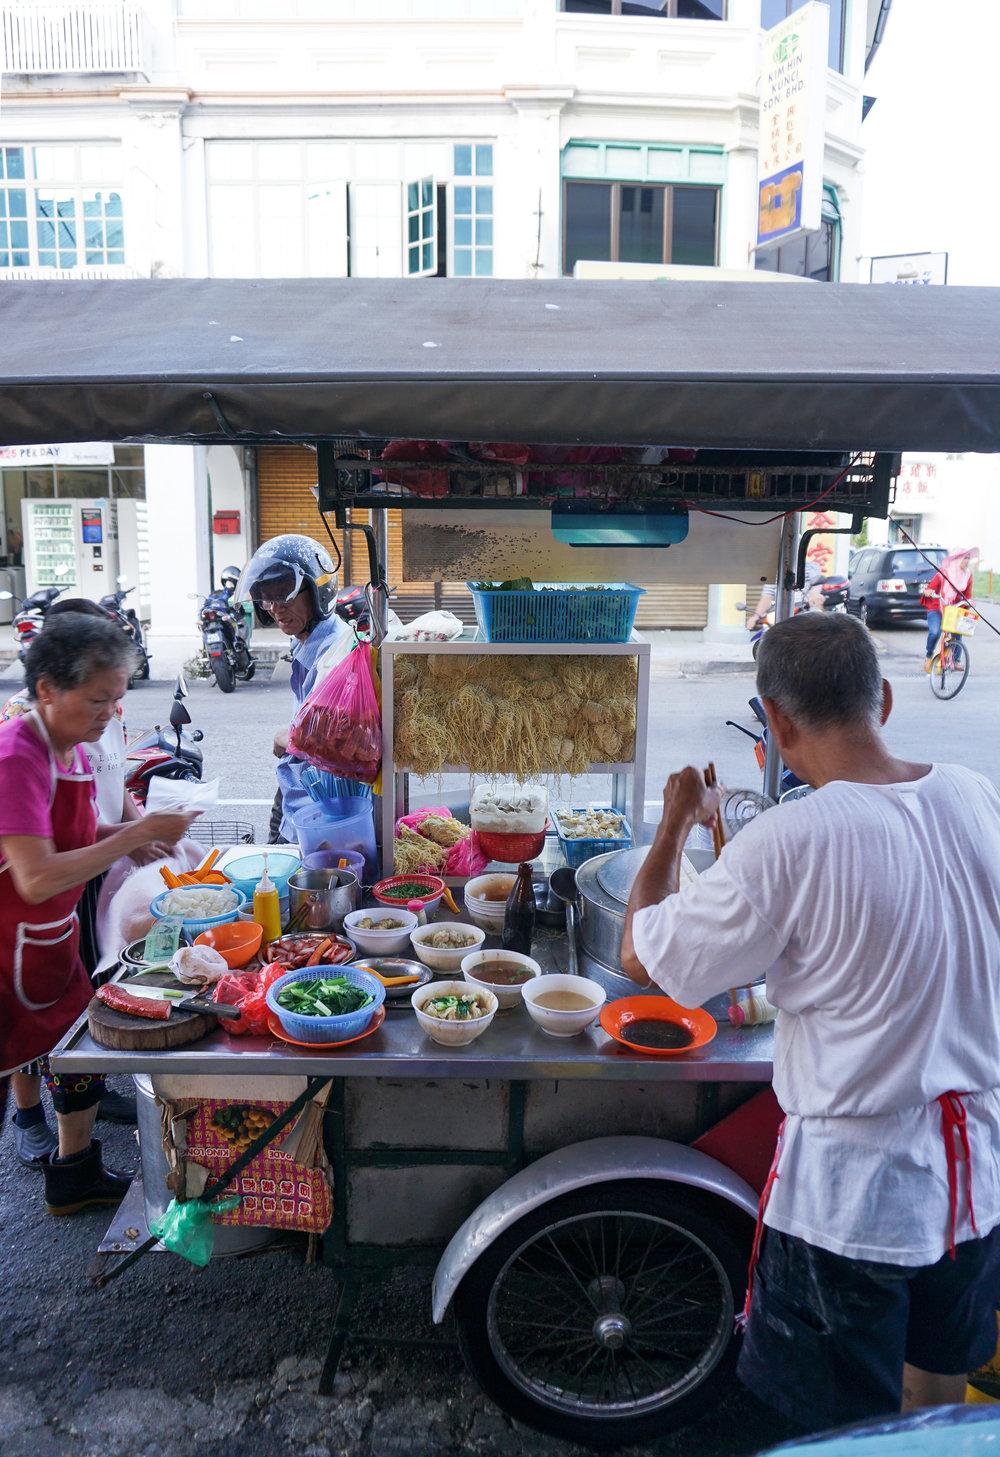 curio.trips.malaysia.penang.street.food.stall.husband.wife.portrait.jpg